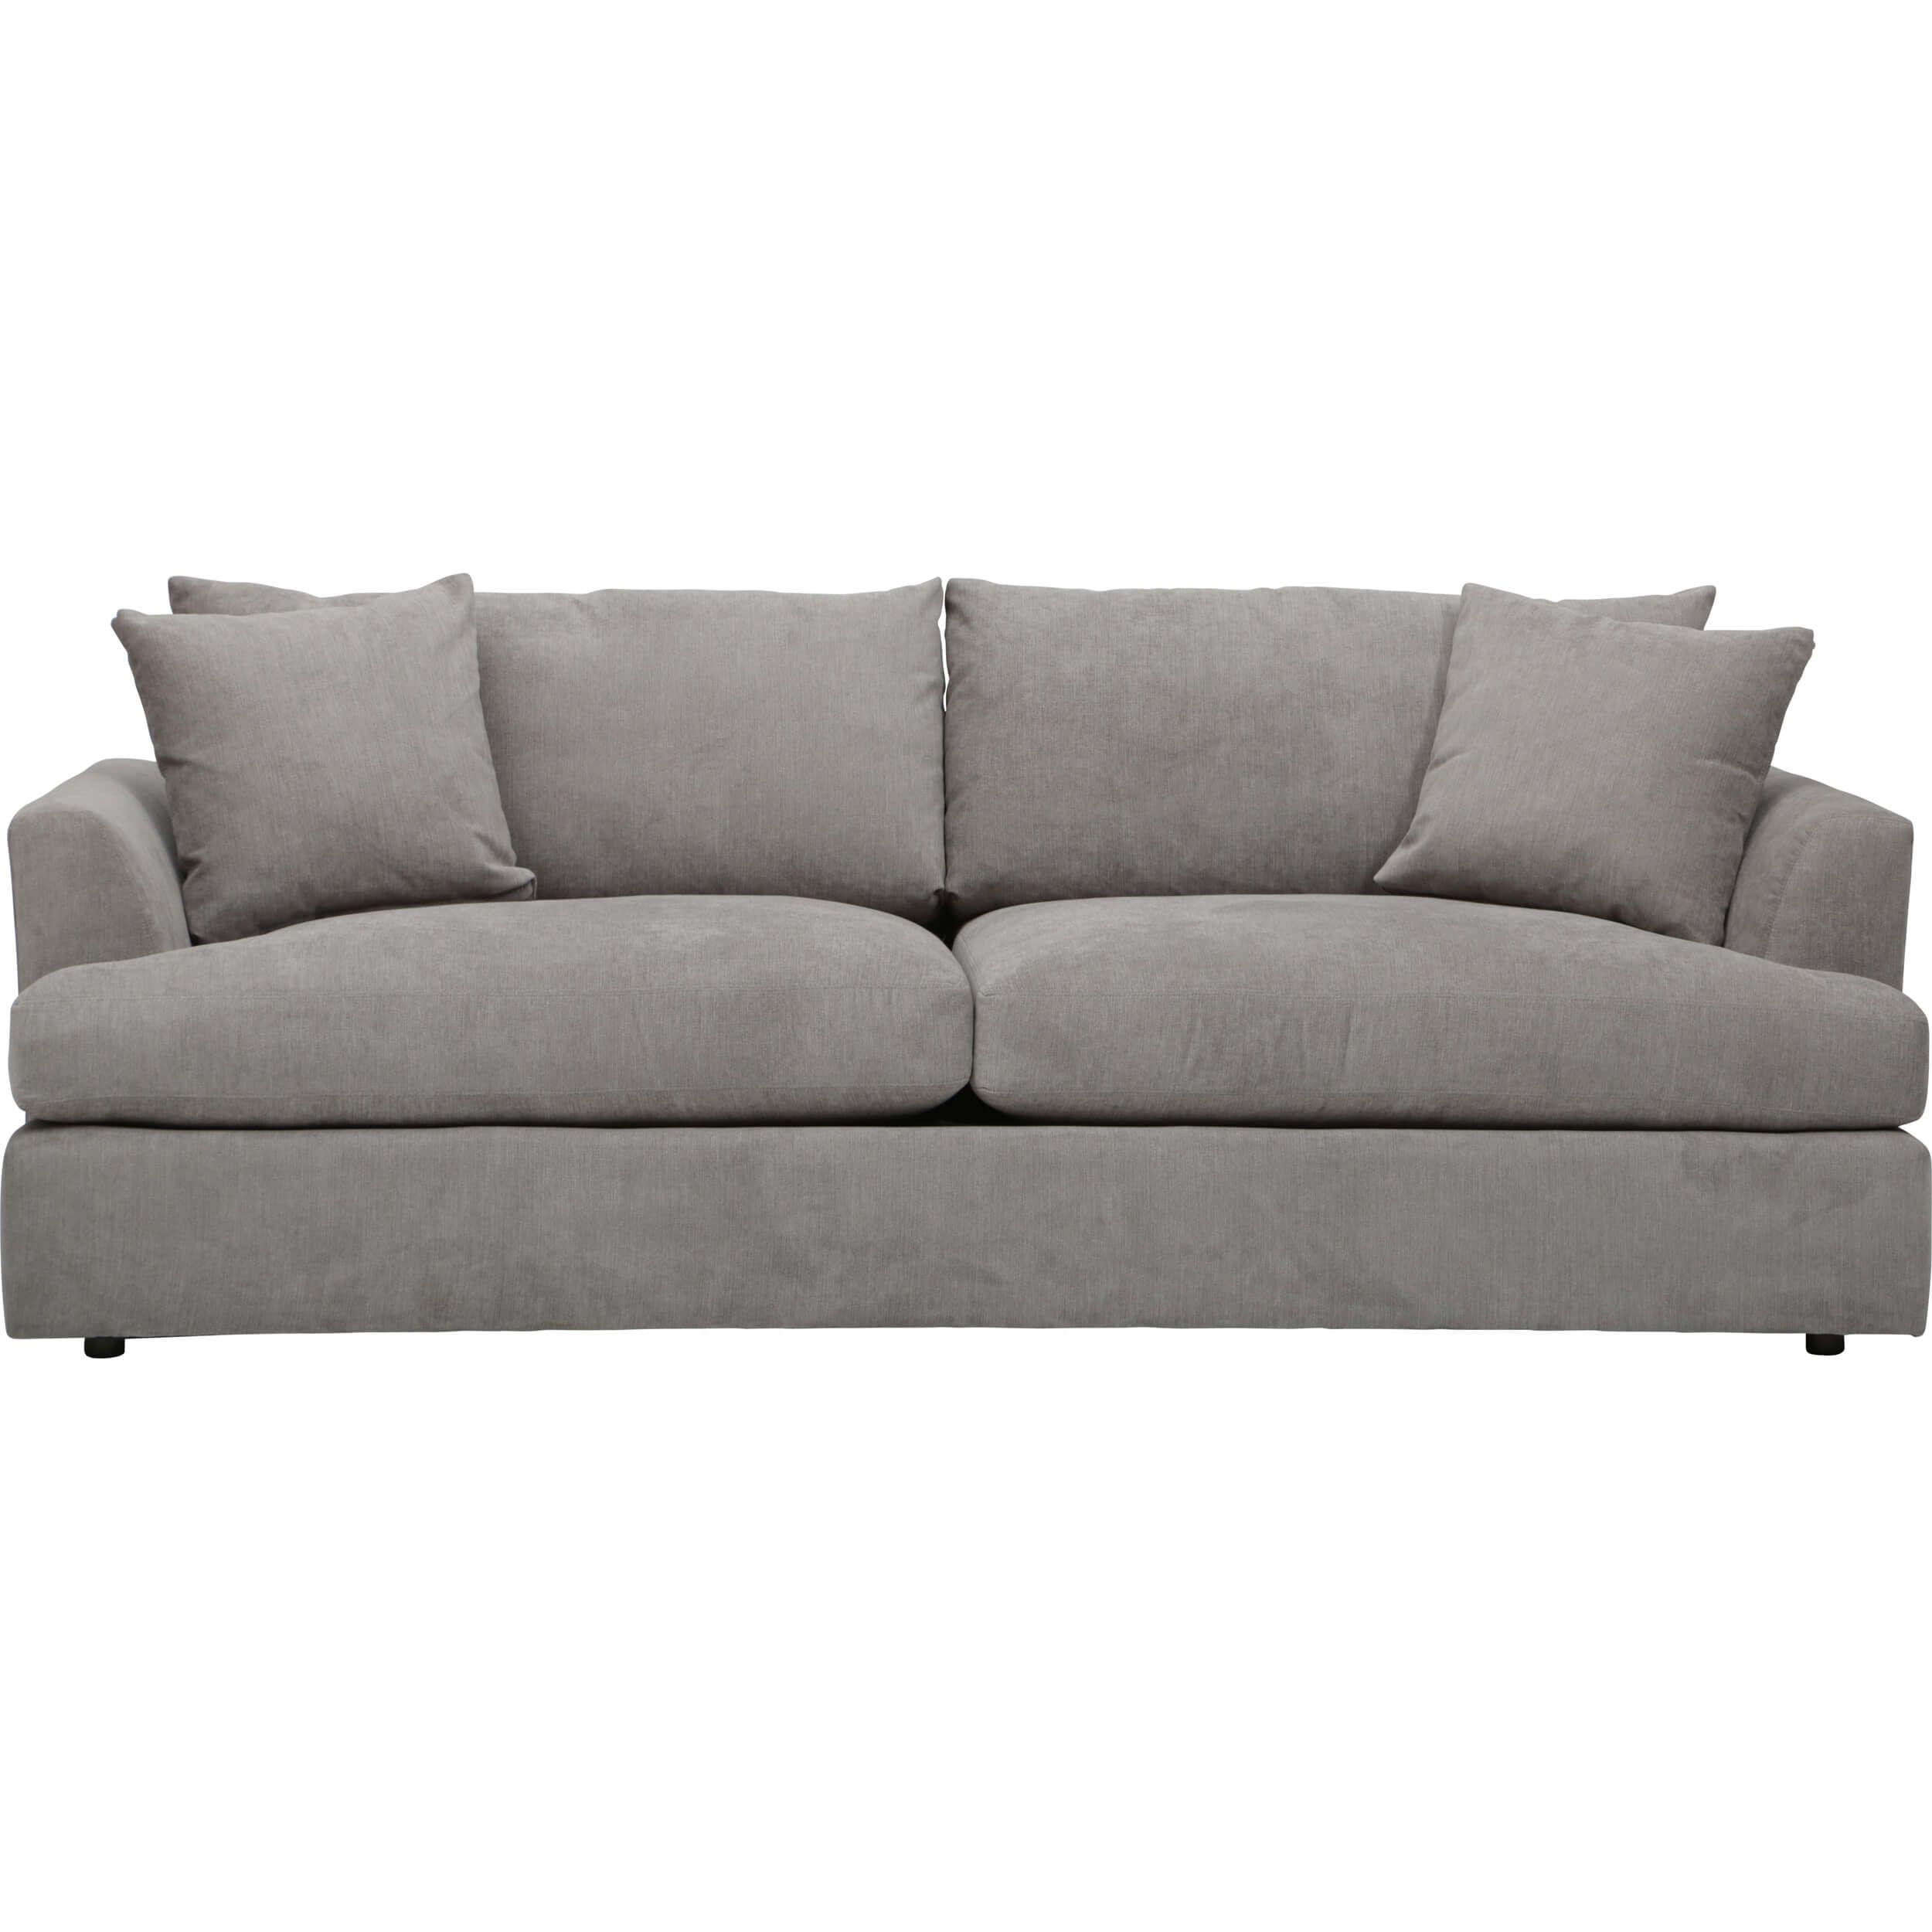 Super Andre Sofa Graceland Slate Dream Home Sofa Living Room Theyellowbook Wood Chair Design Ideas Theyellowbookinfo